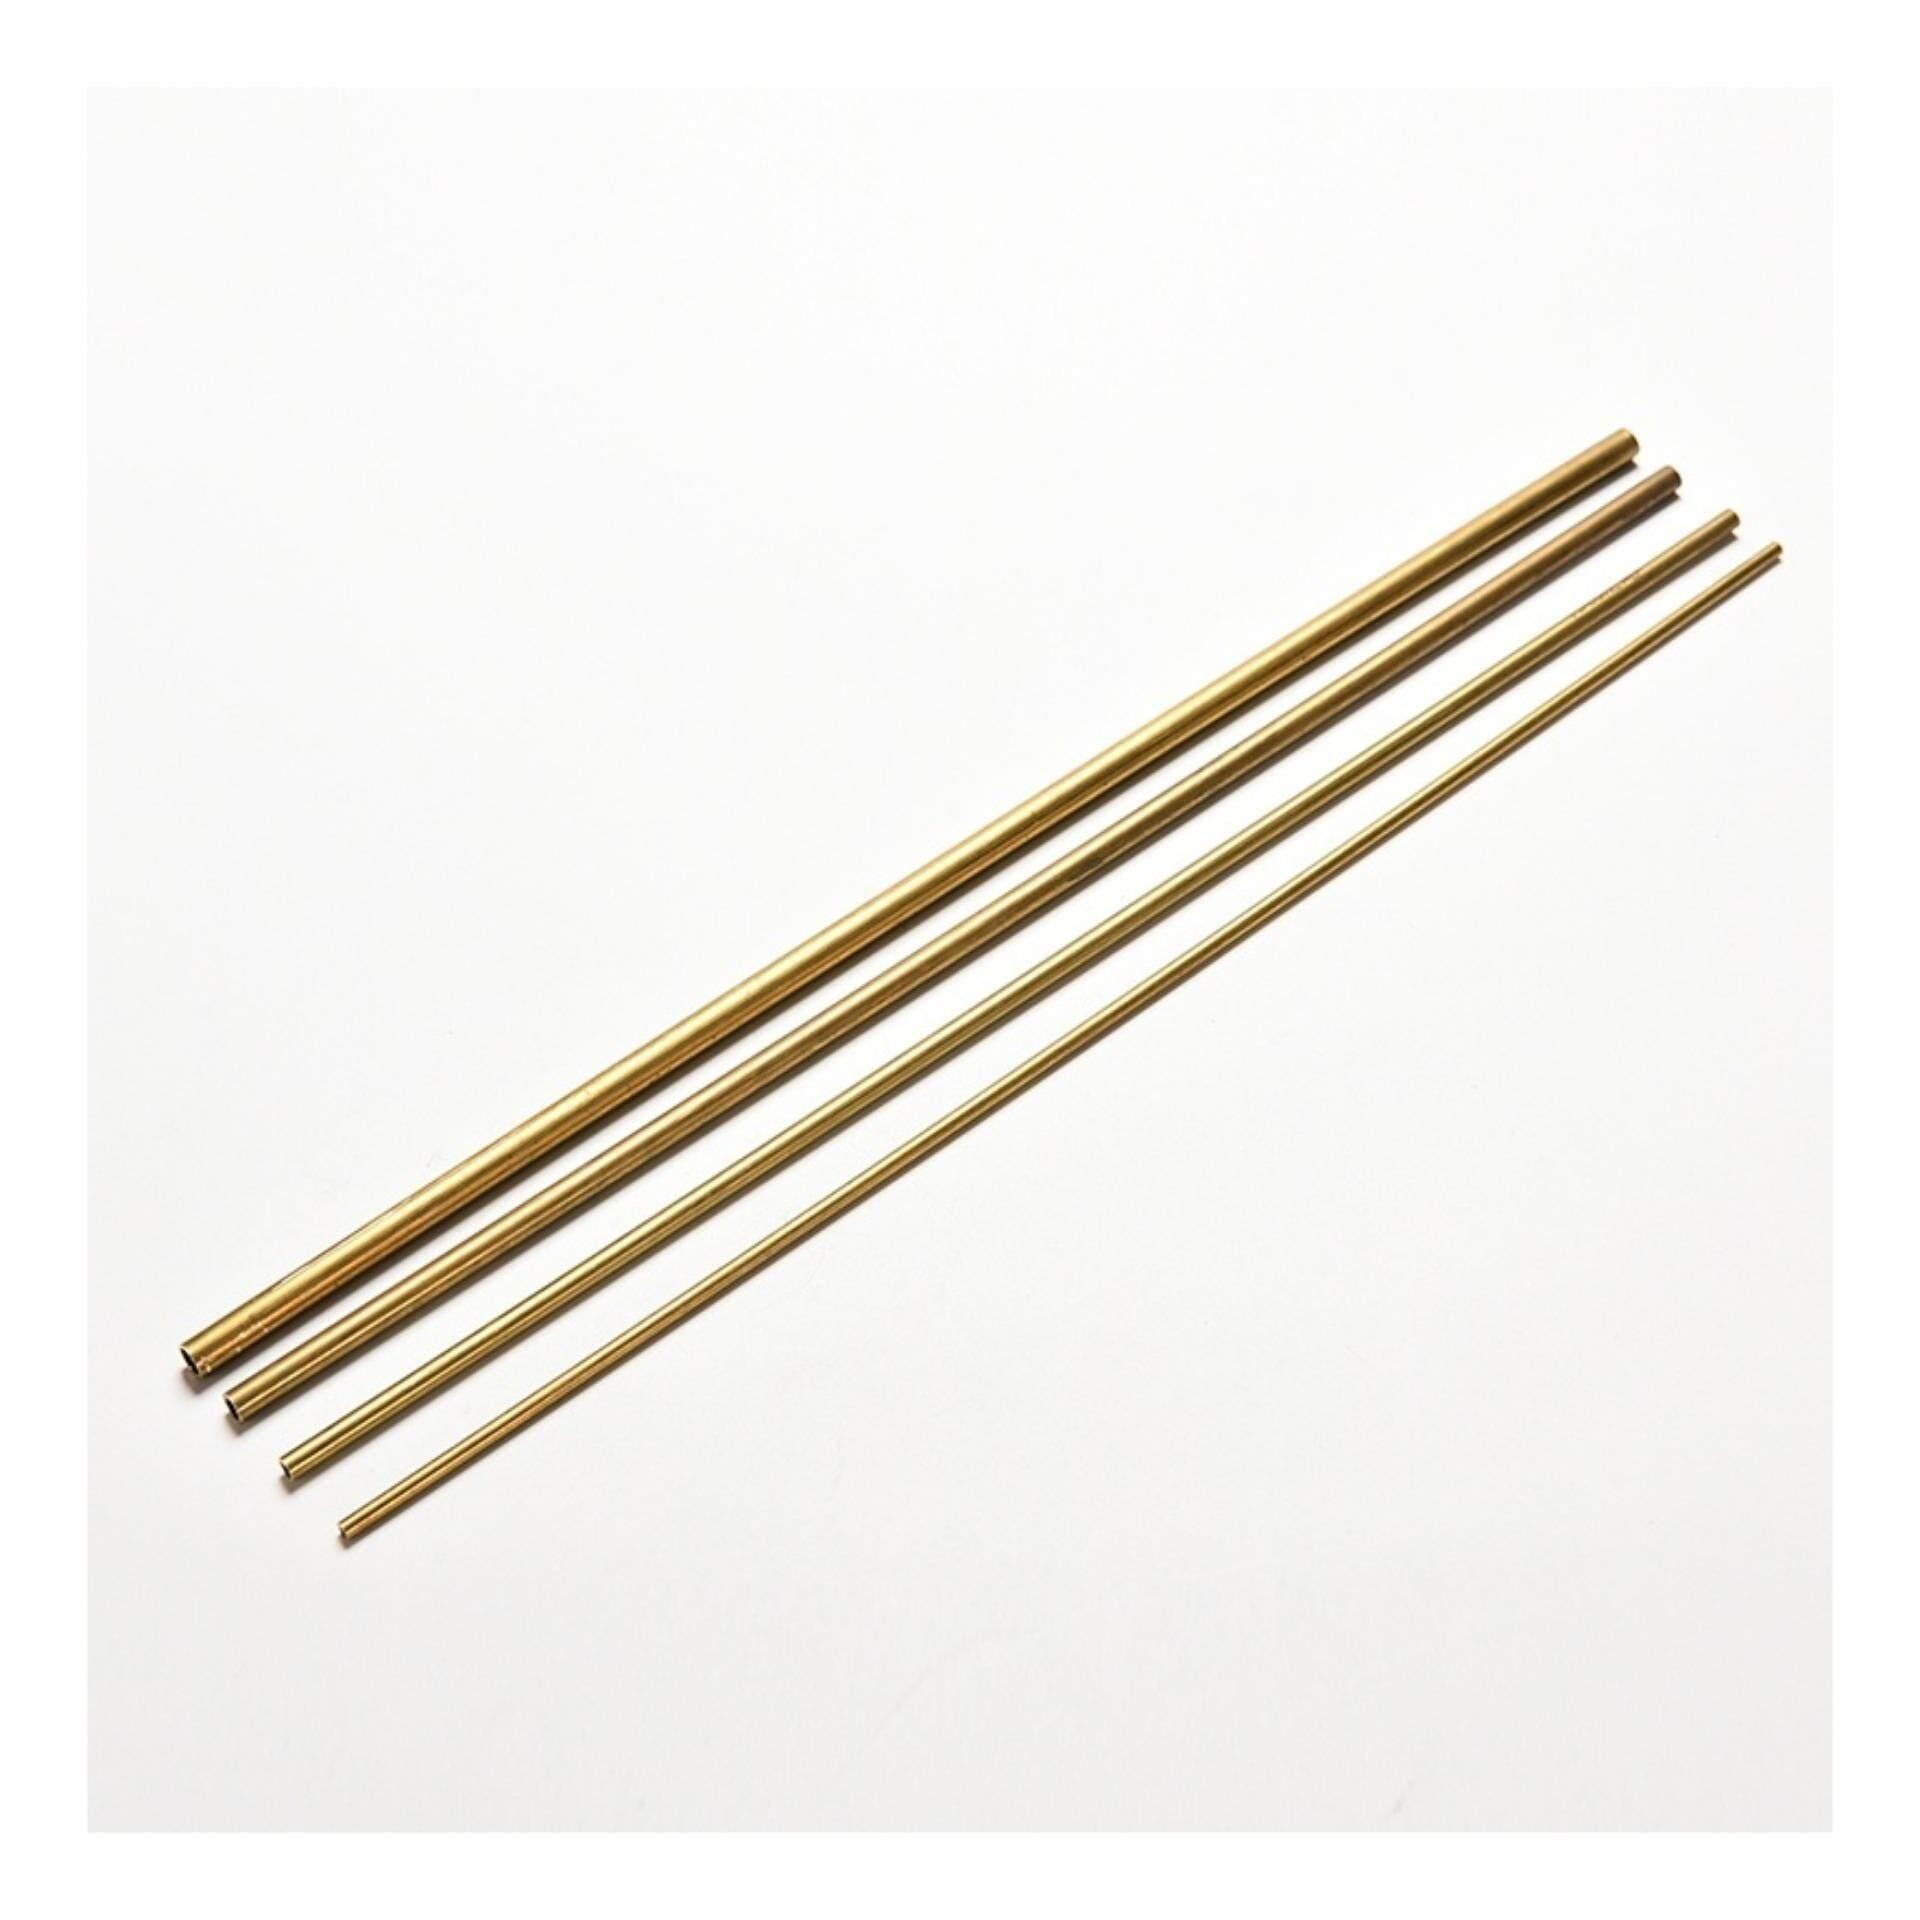 Brass Tube Pipe Tubing Round Inner 2mm 3mm 4mm 5mm Long 300mm Wall 0.5mm - intl